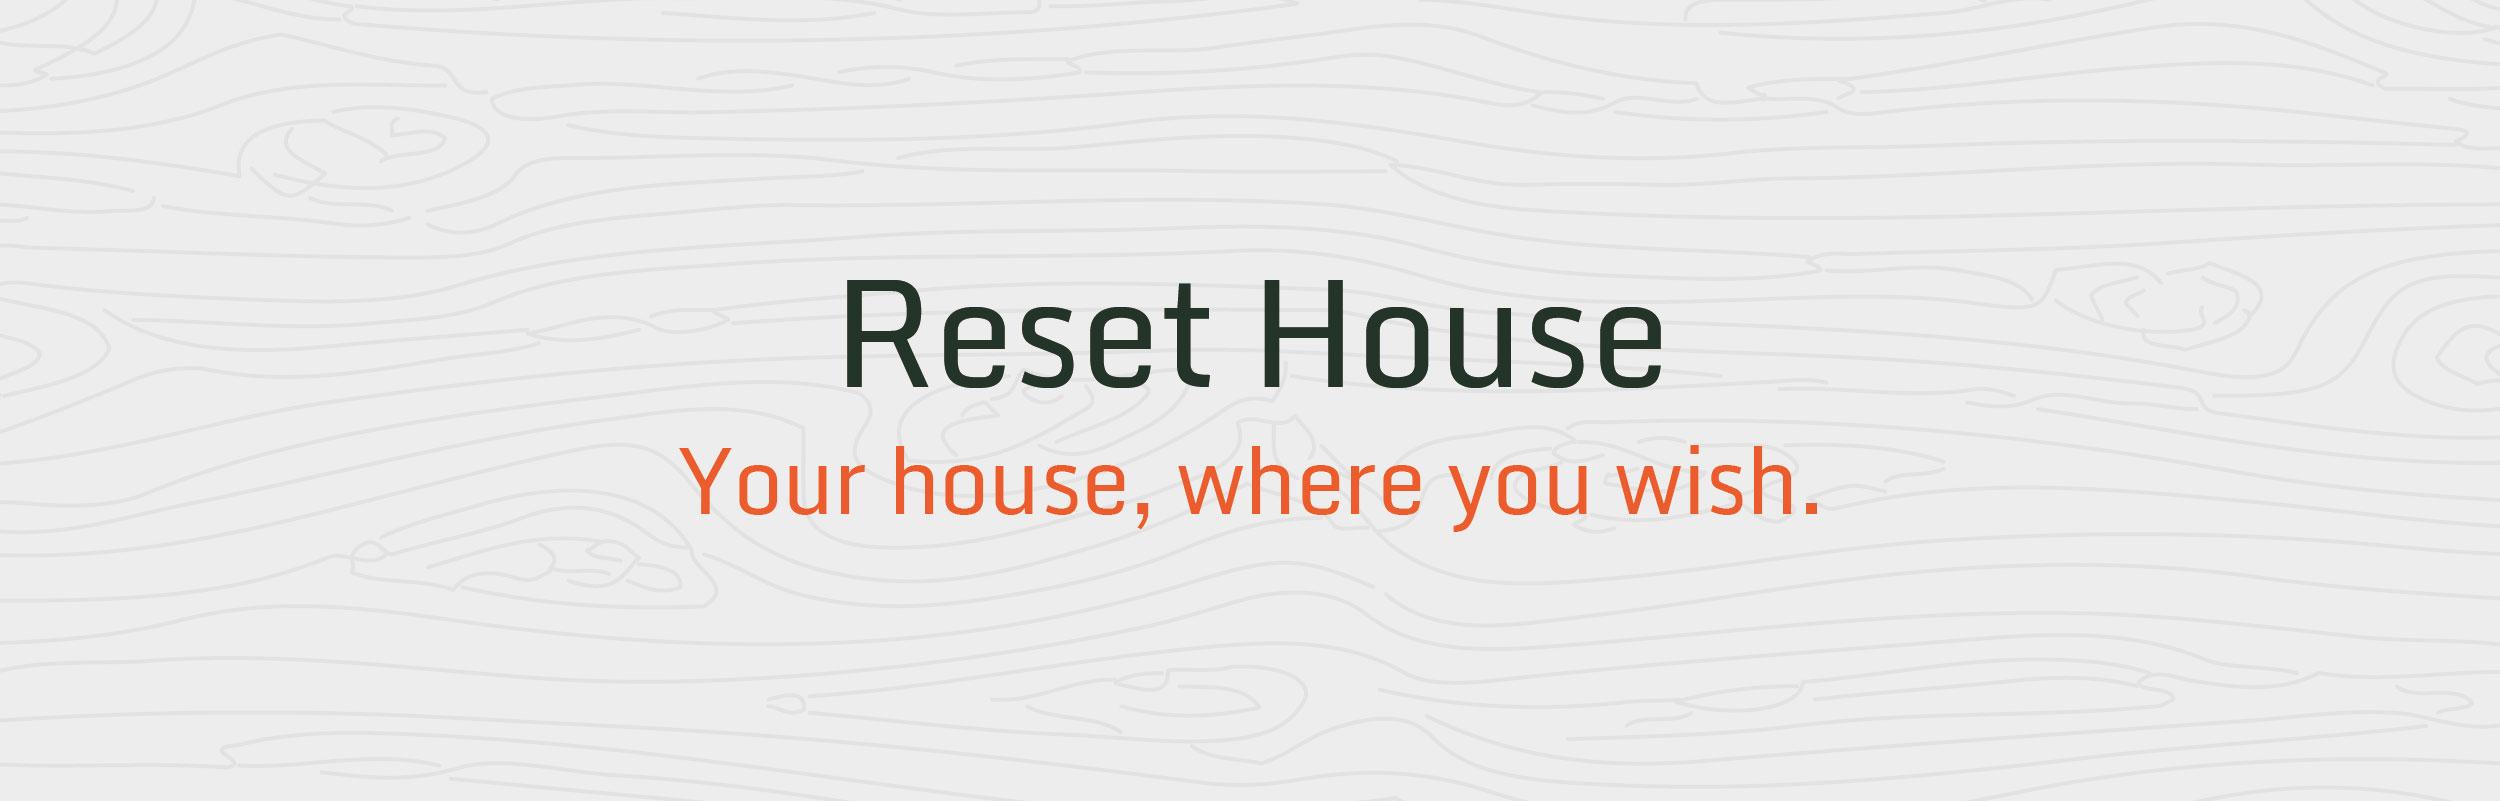 Reset House by GPU Design